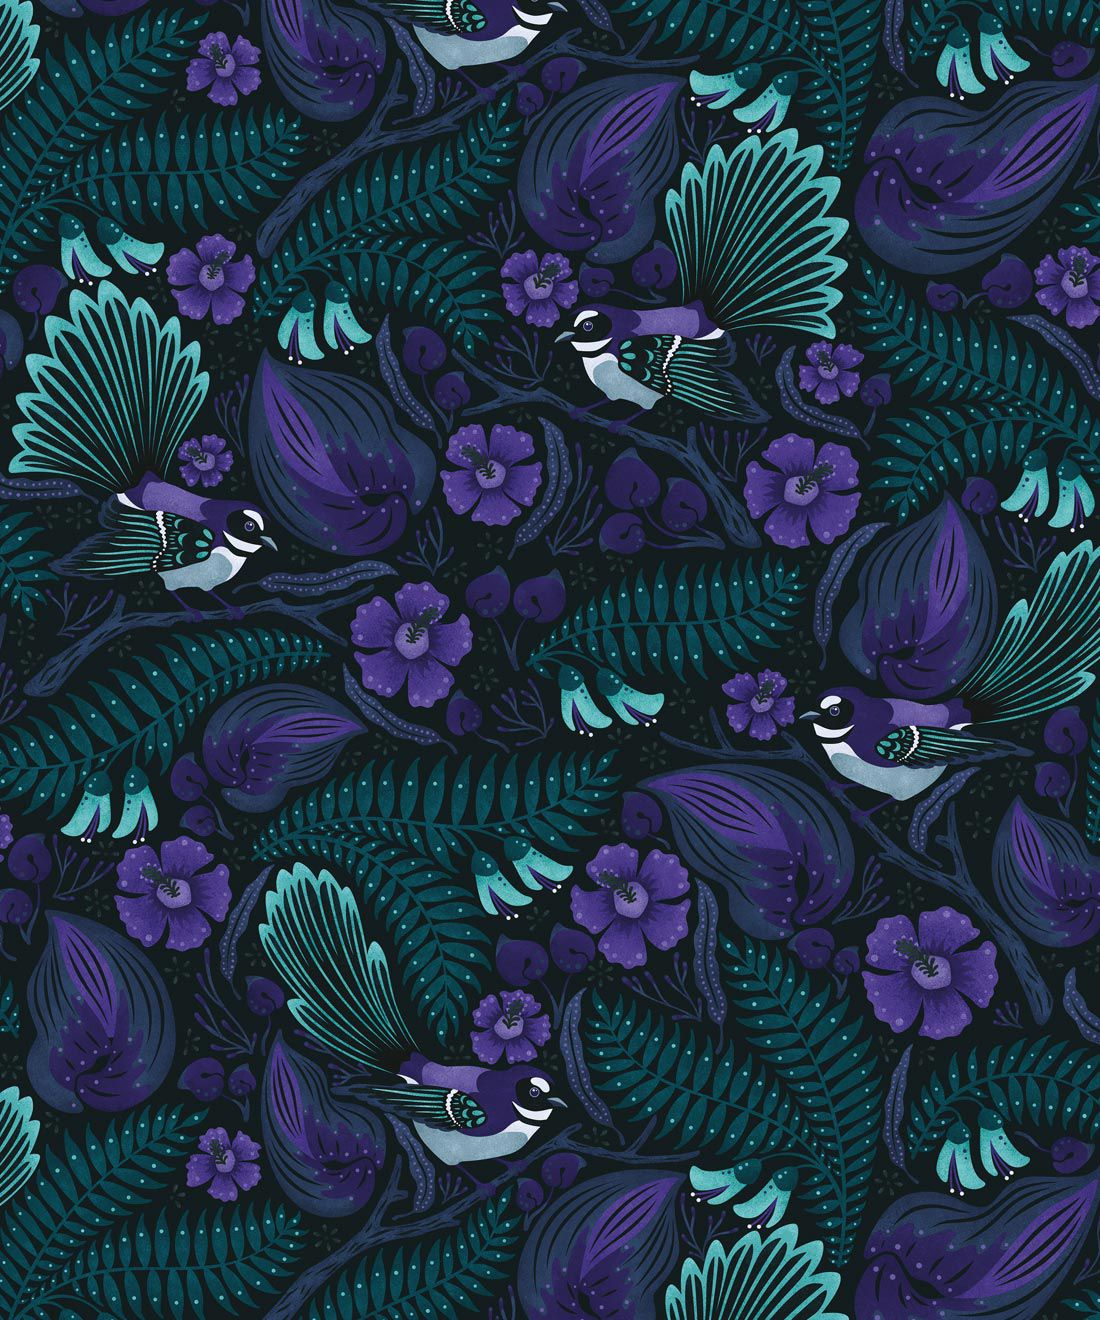 Faintails Wallpaper • New Zealand • Bird Wallpaper • Kowhai Tree • Kowhai Flowers • Dark Purple Blue Wallpaper • Midnight Colorway